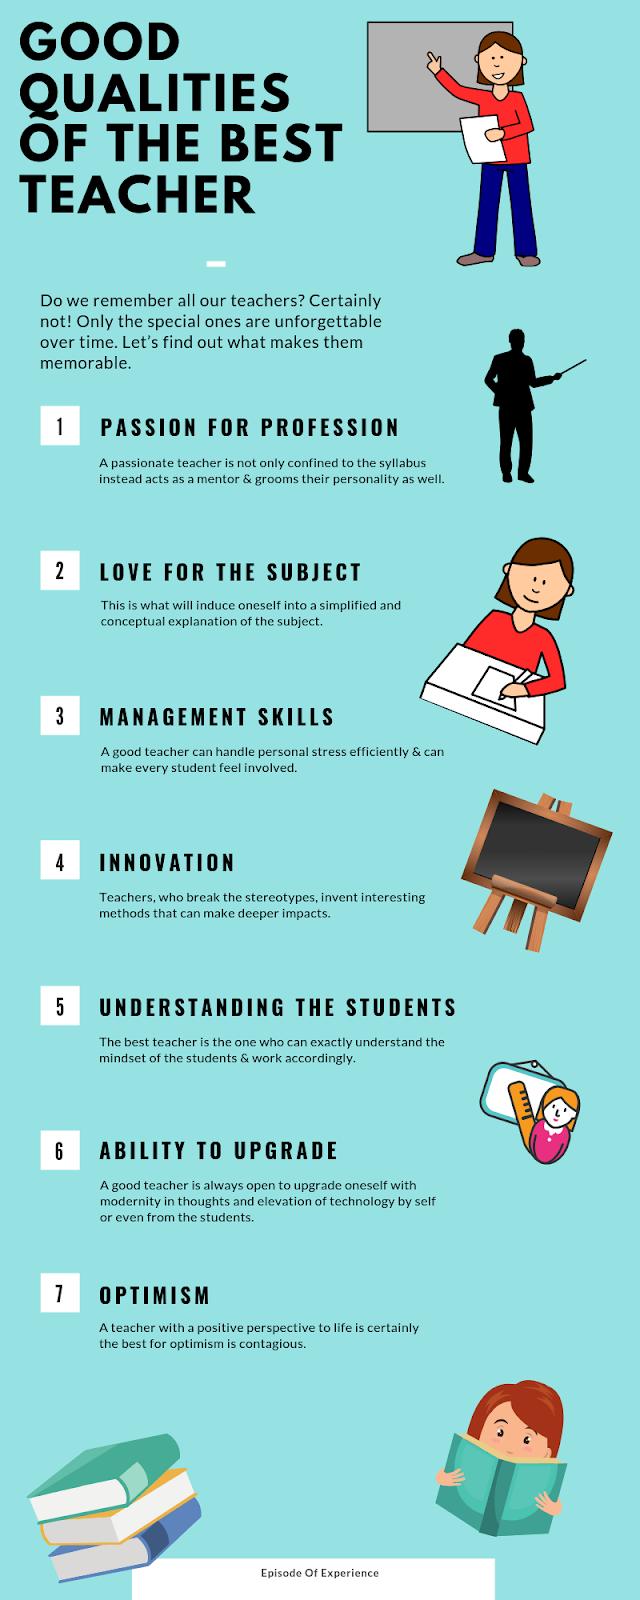 7-Good-Qualities-of-the-Best-Teacher